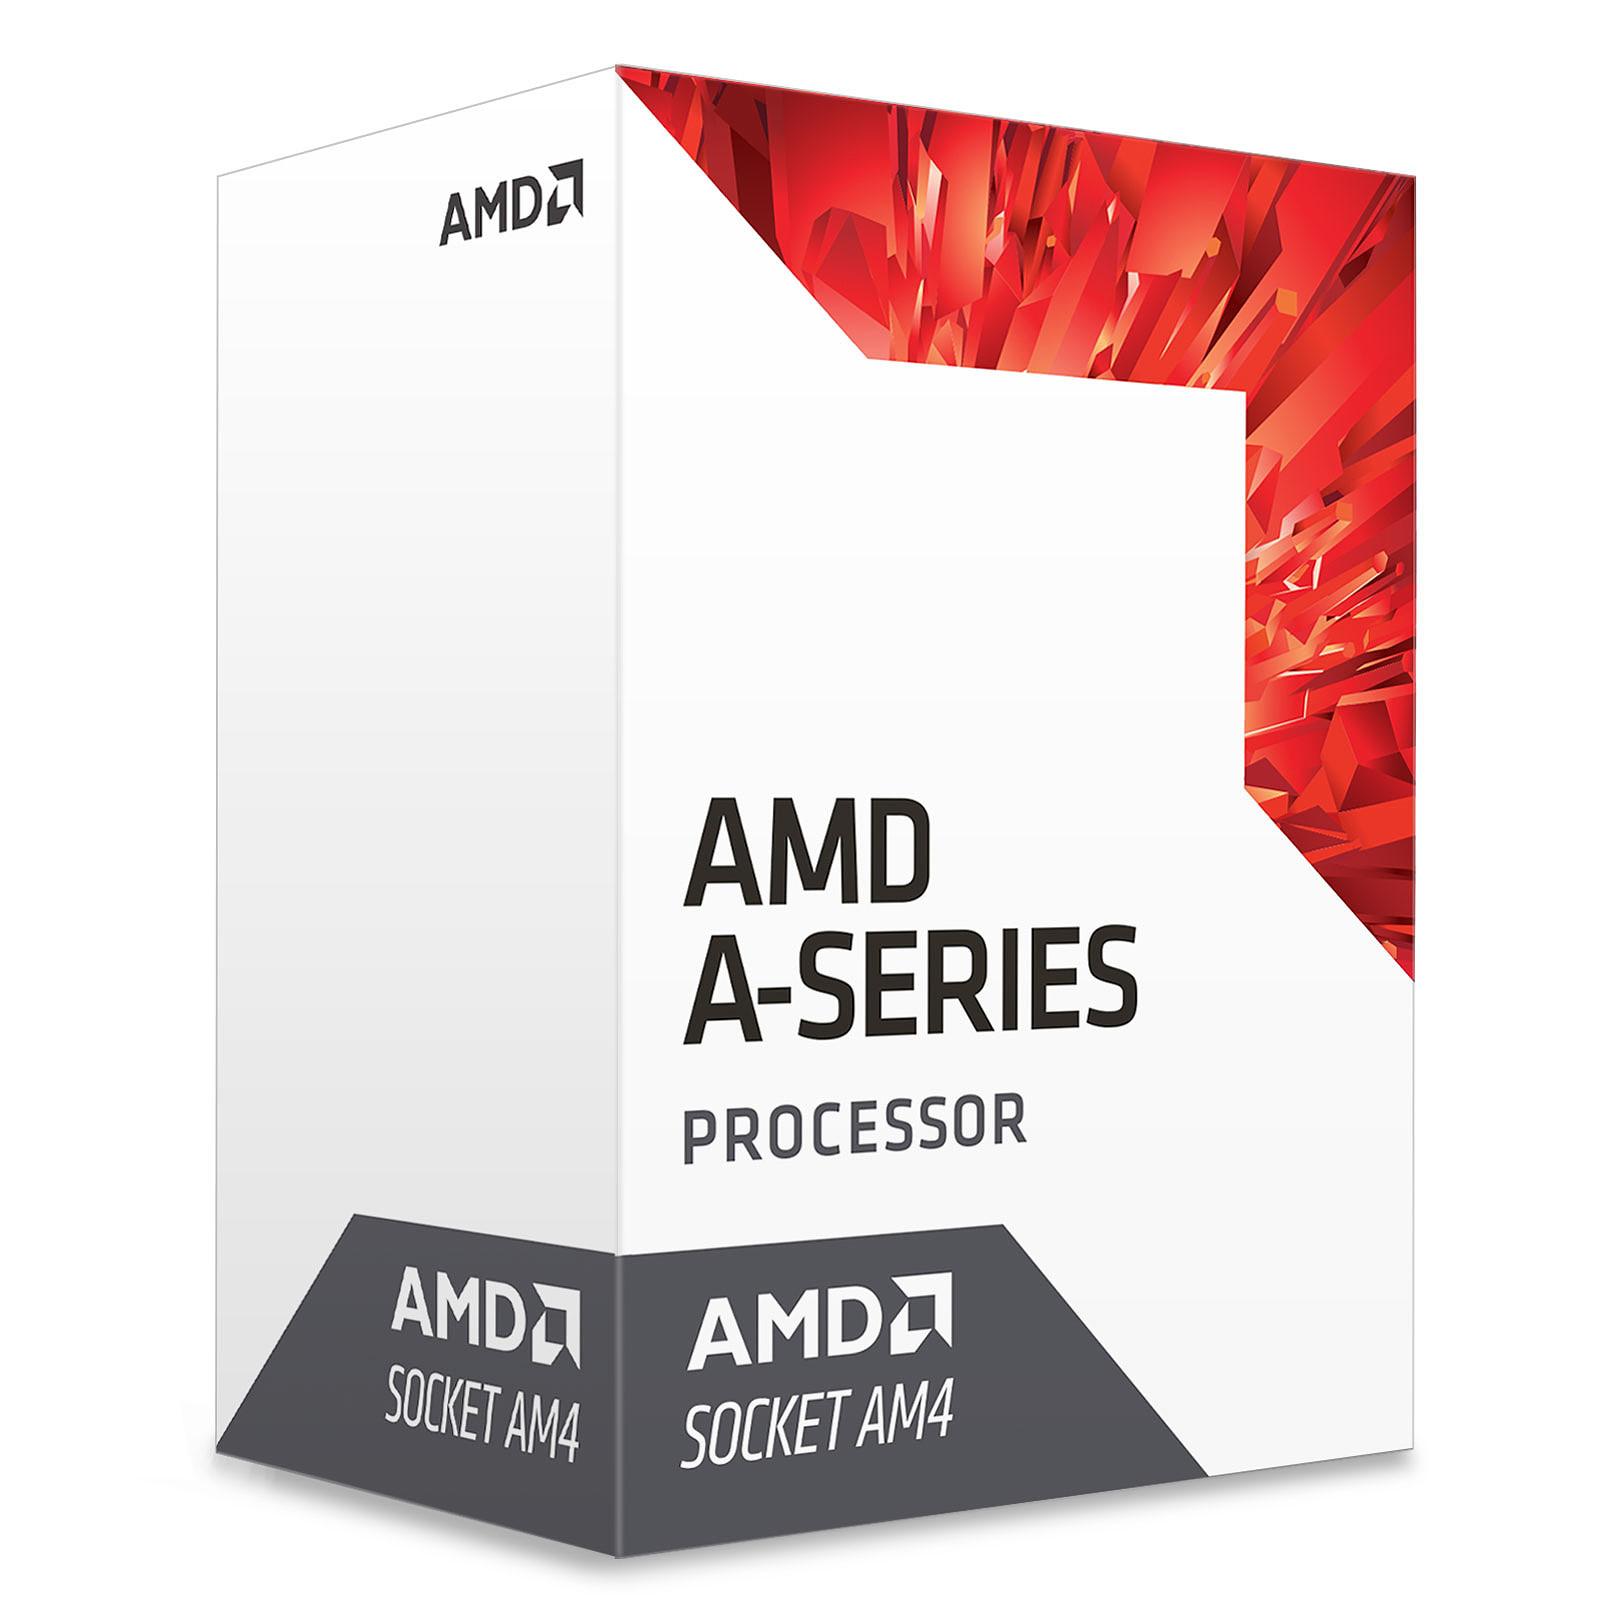 AMD A12-9800E (3.1 GHz)